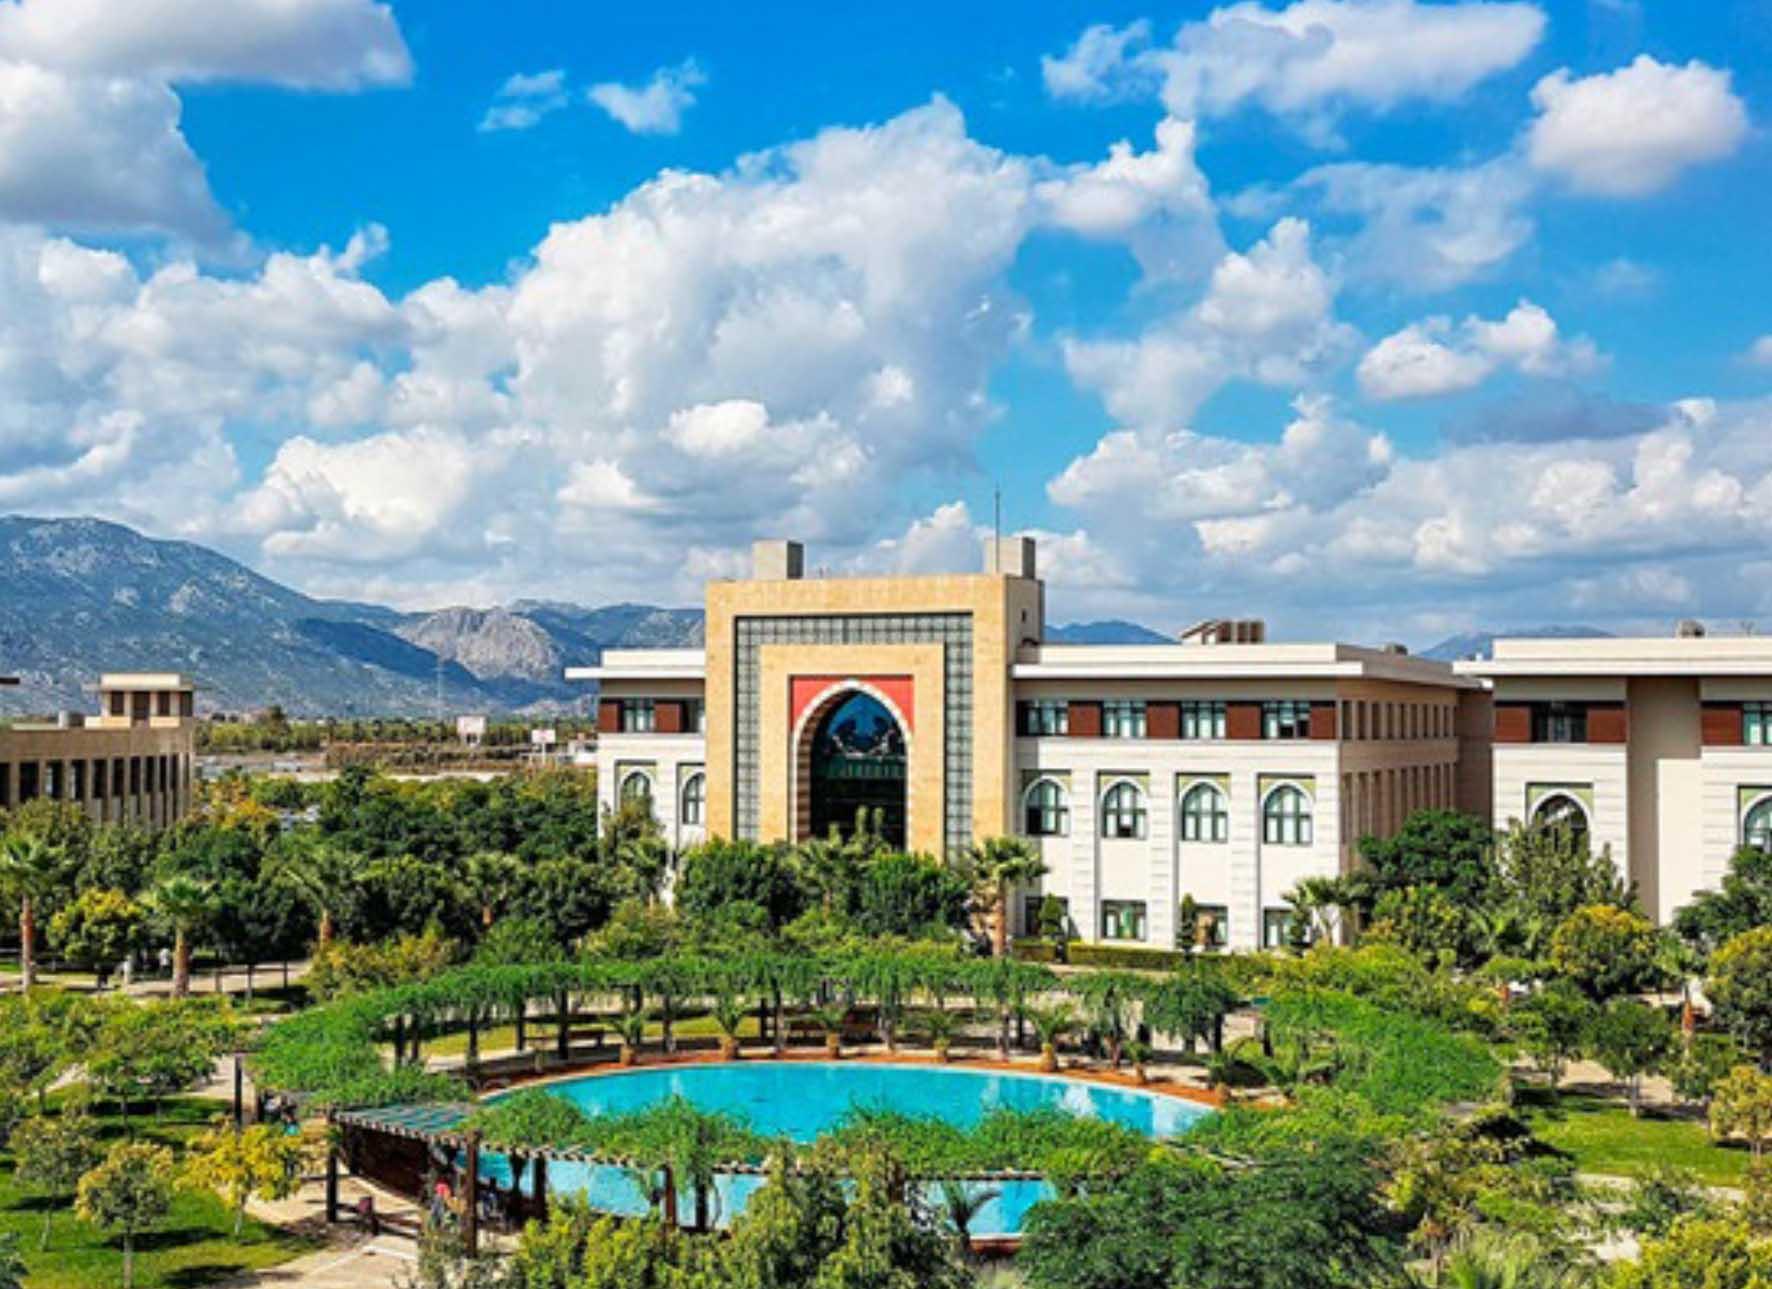 Razmjena studenata na Univerzitetu Antalya Bilim